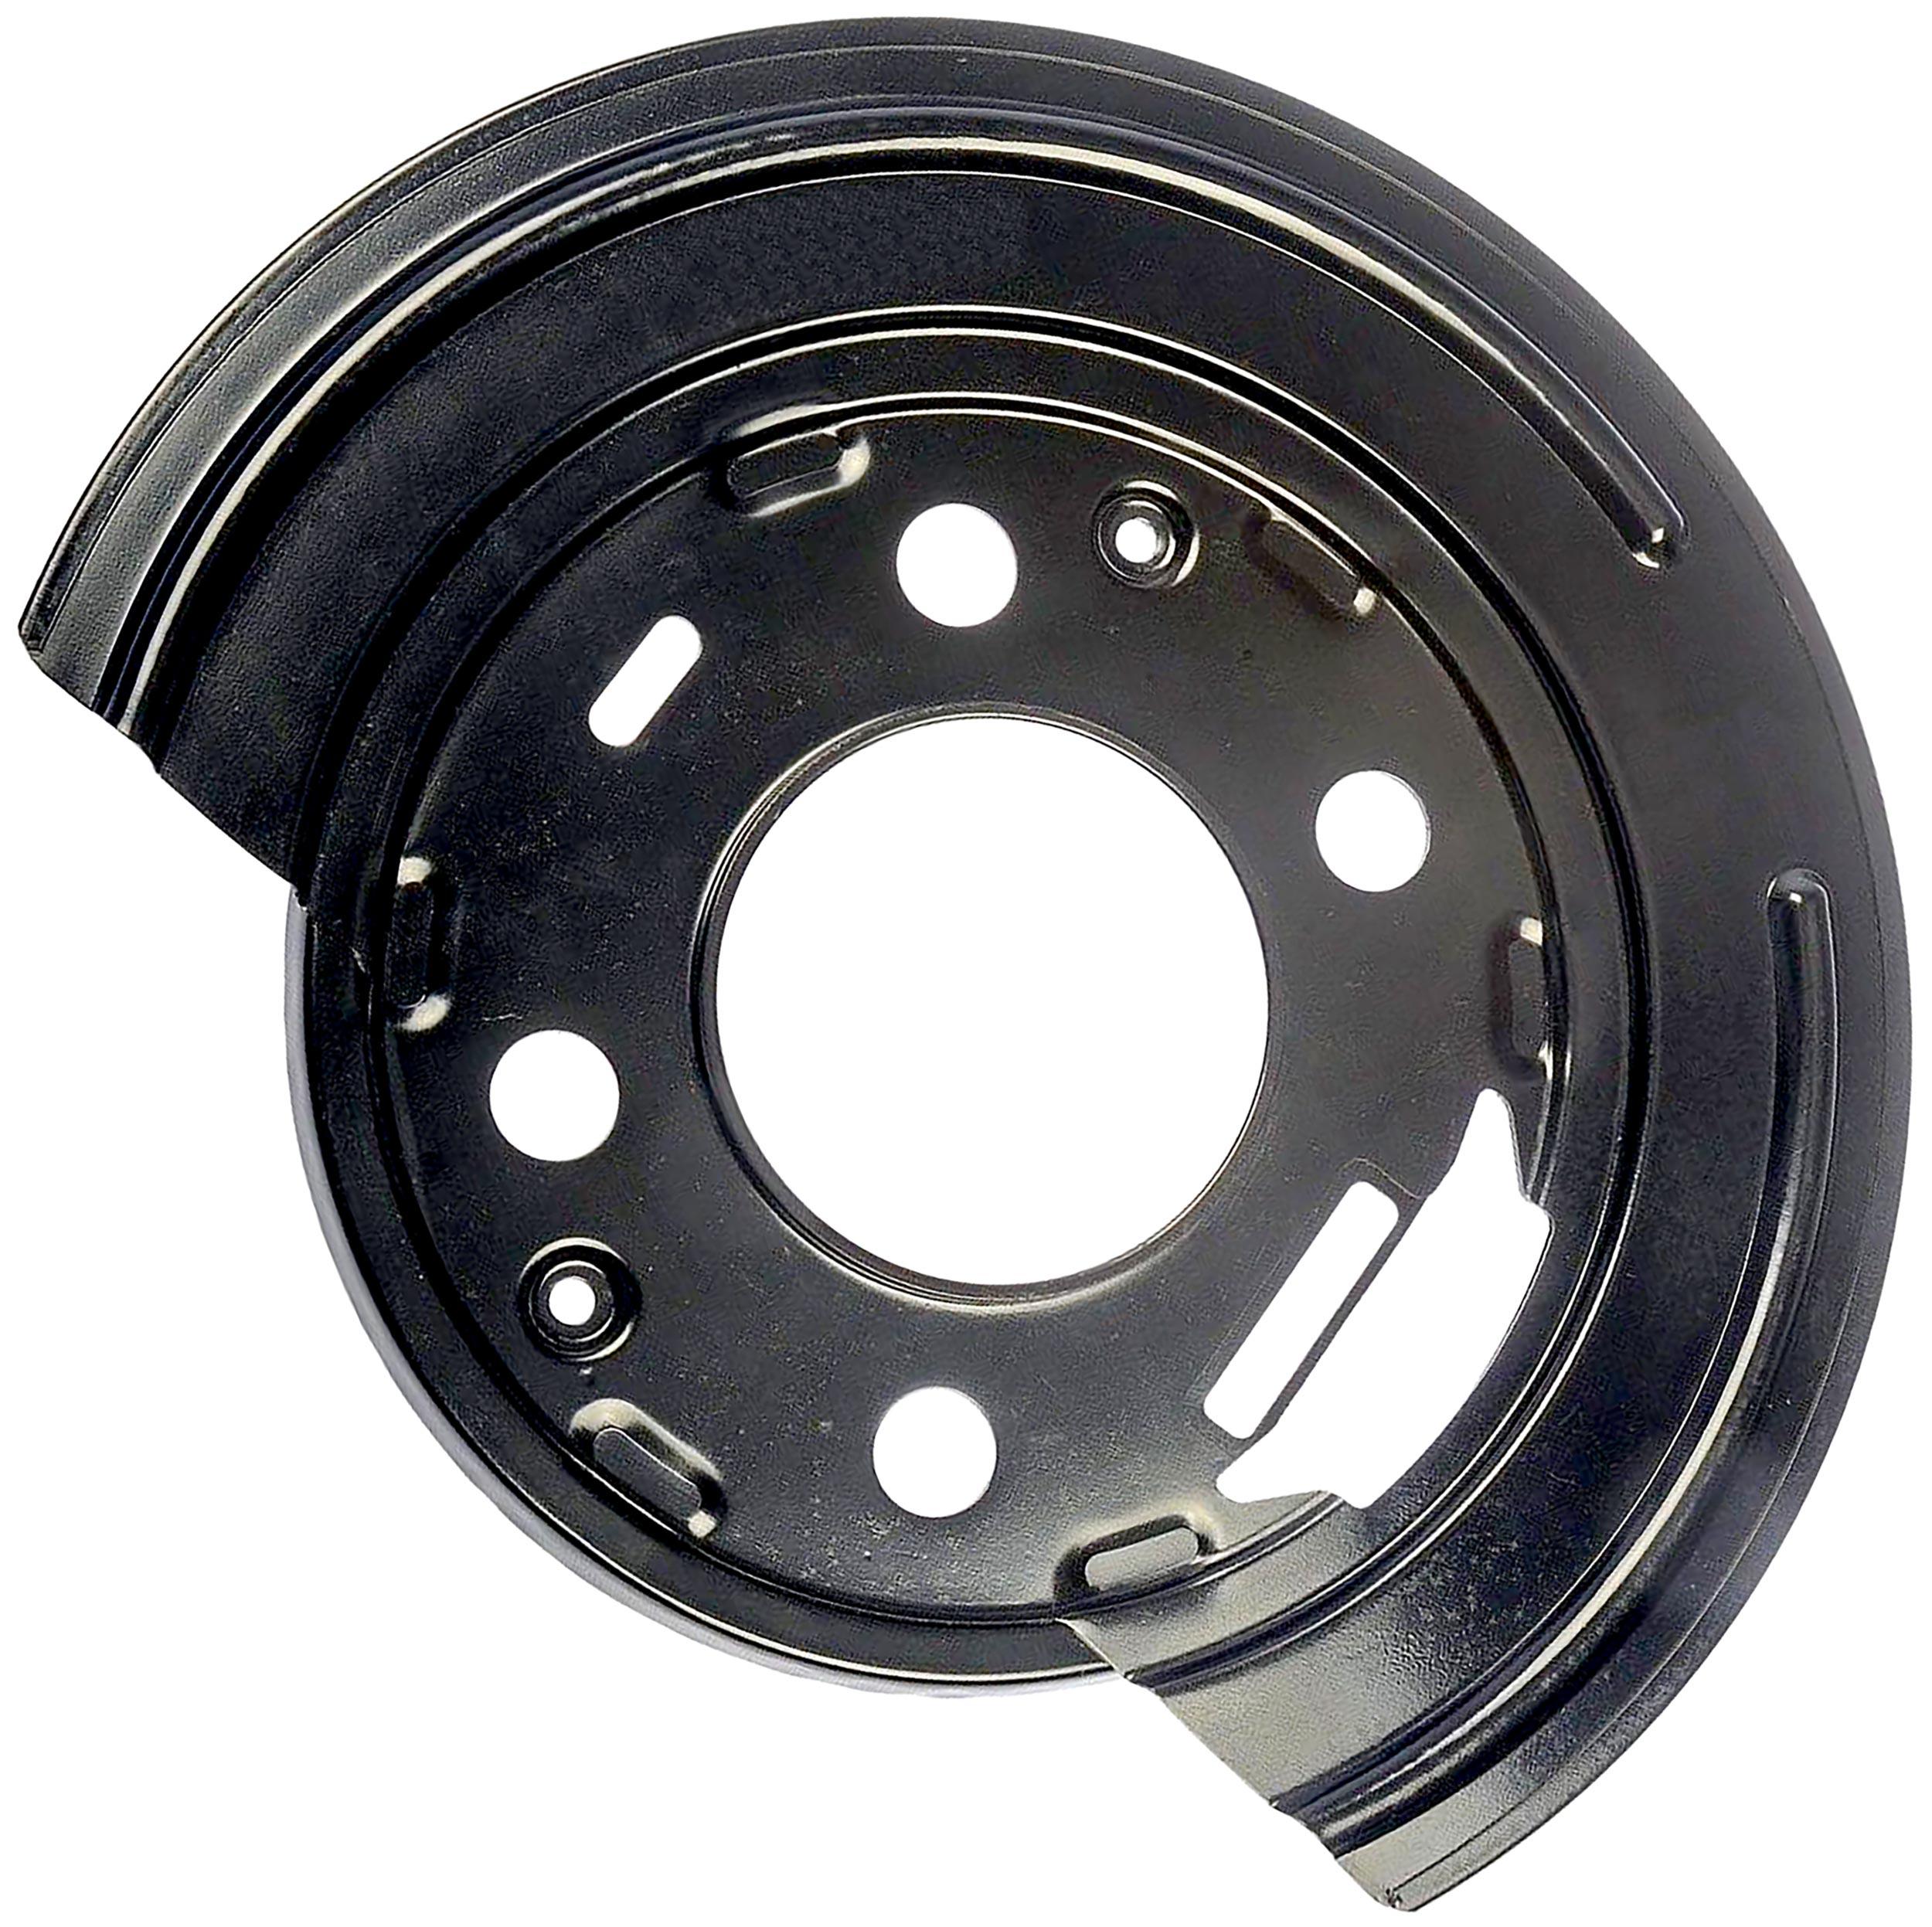 Fits Various Chevrolet /& GMC Models Brake Dust Shield